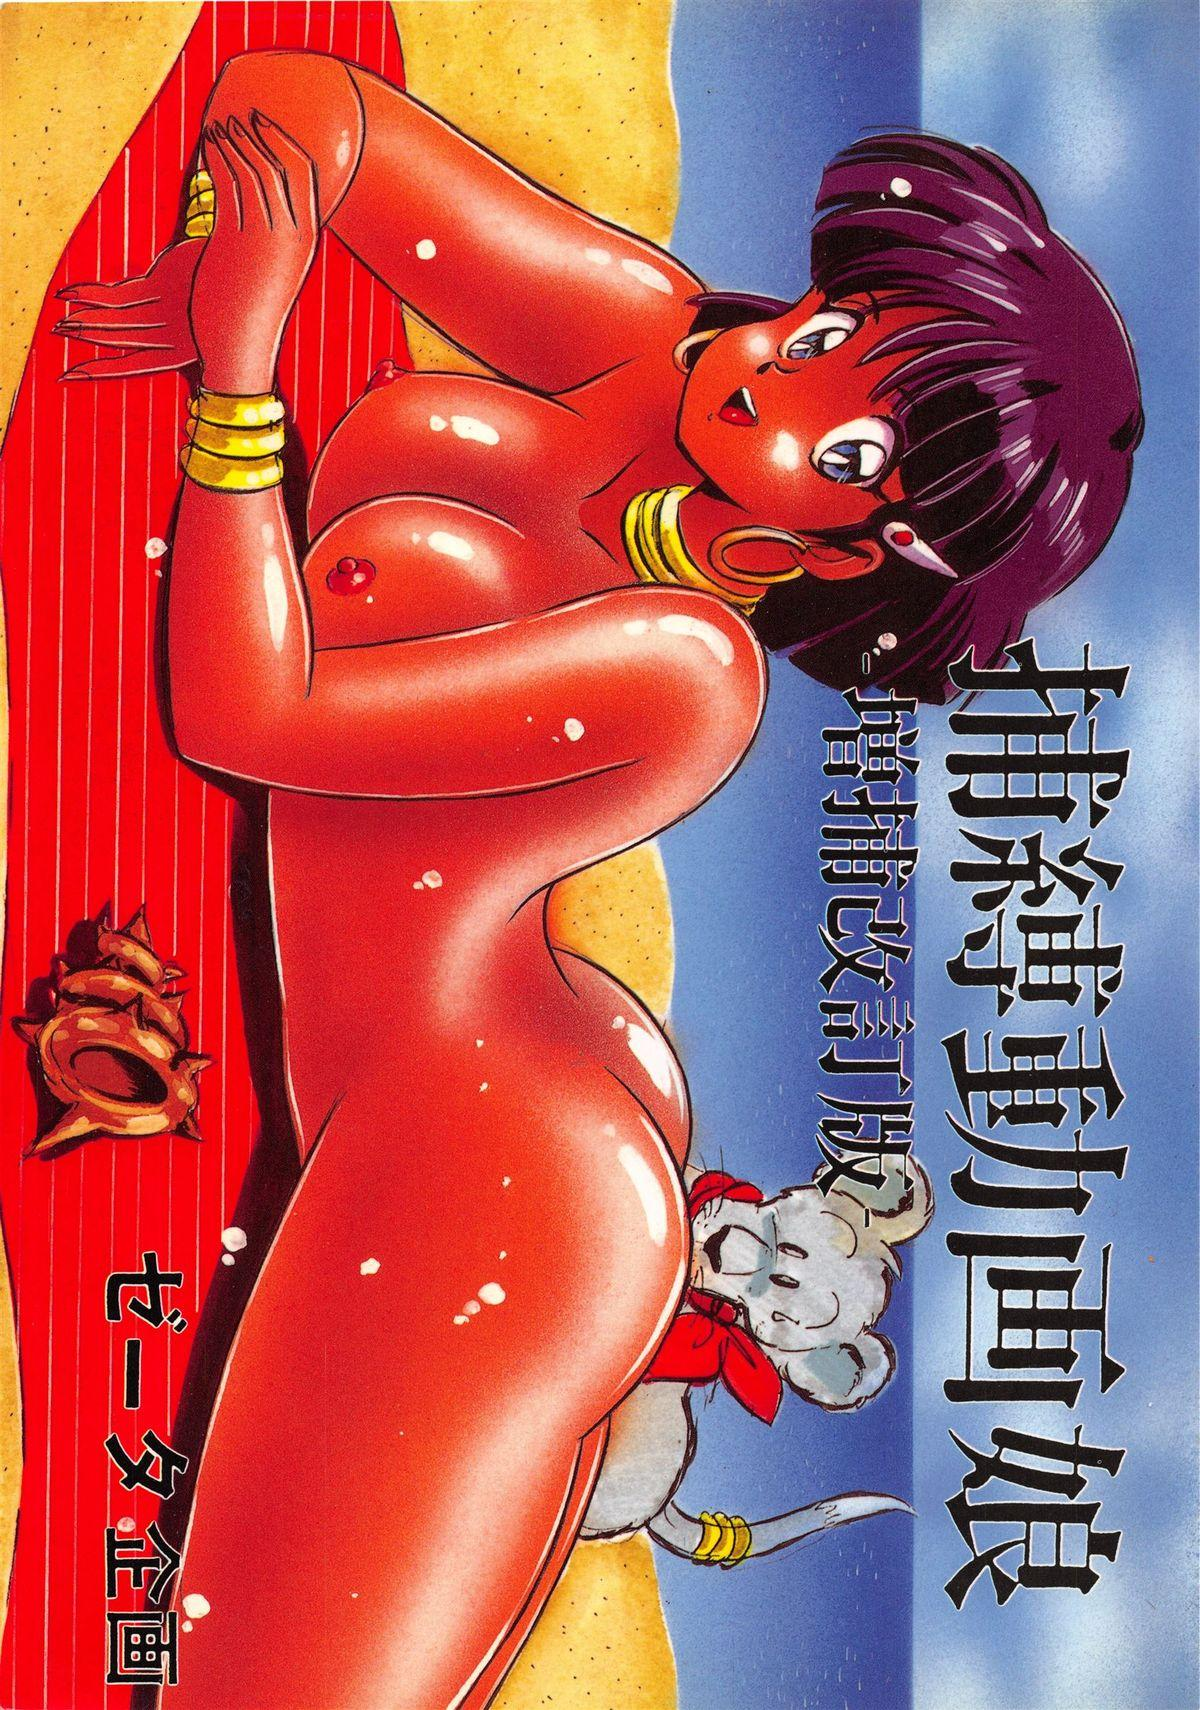 Hobaku Douga Musume - Zouho Kaiteiban 0